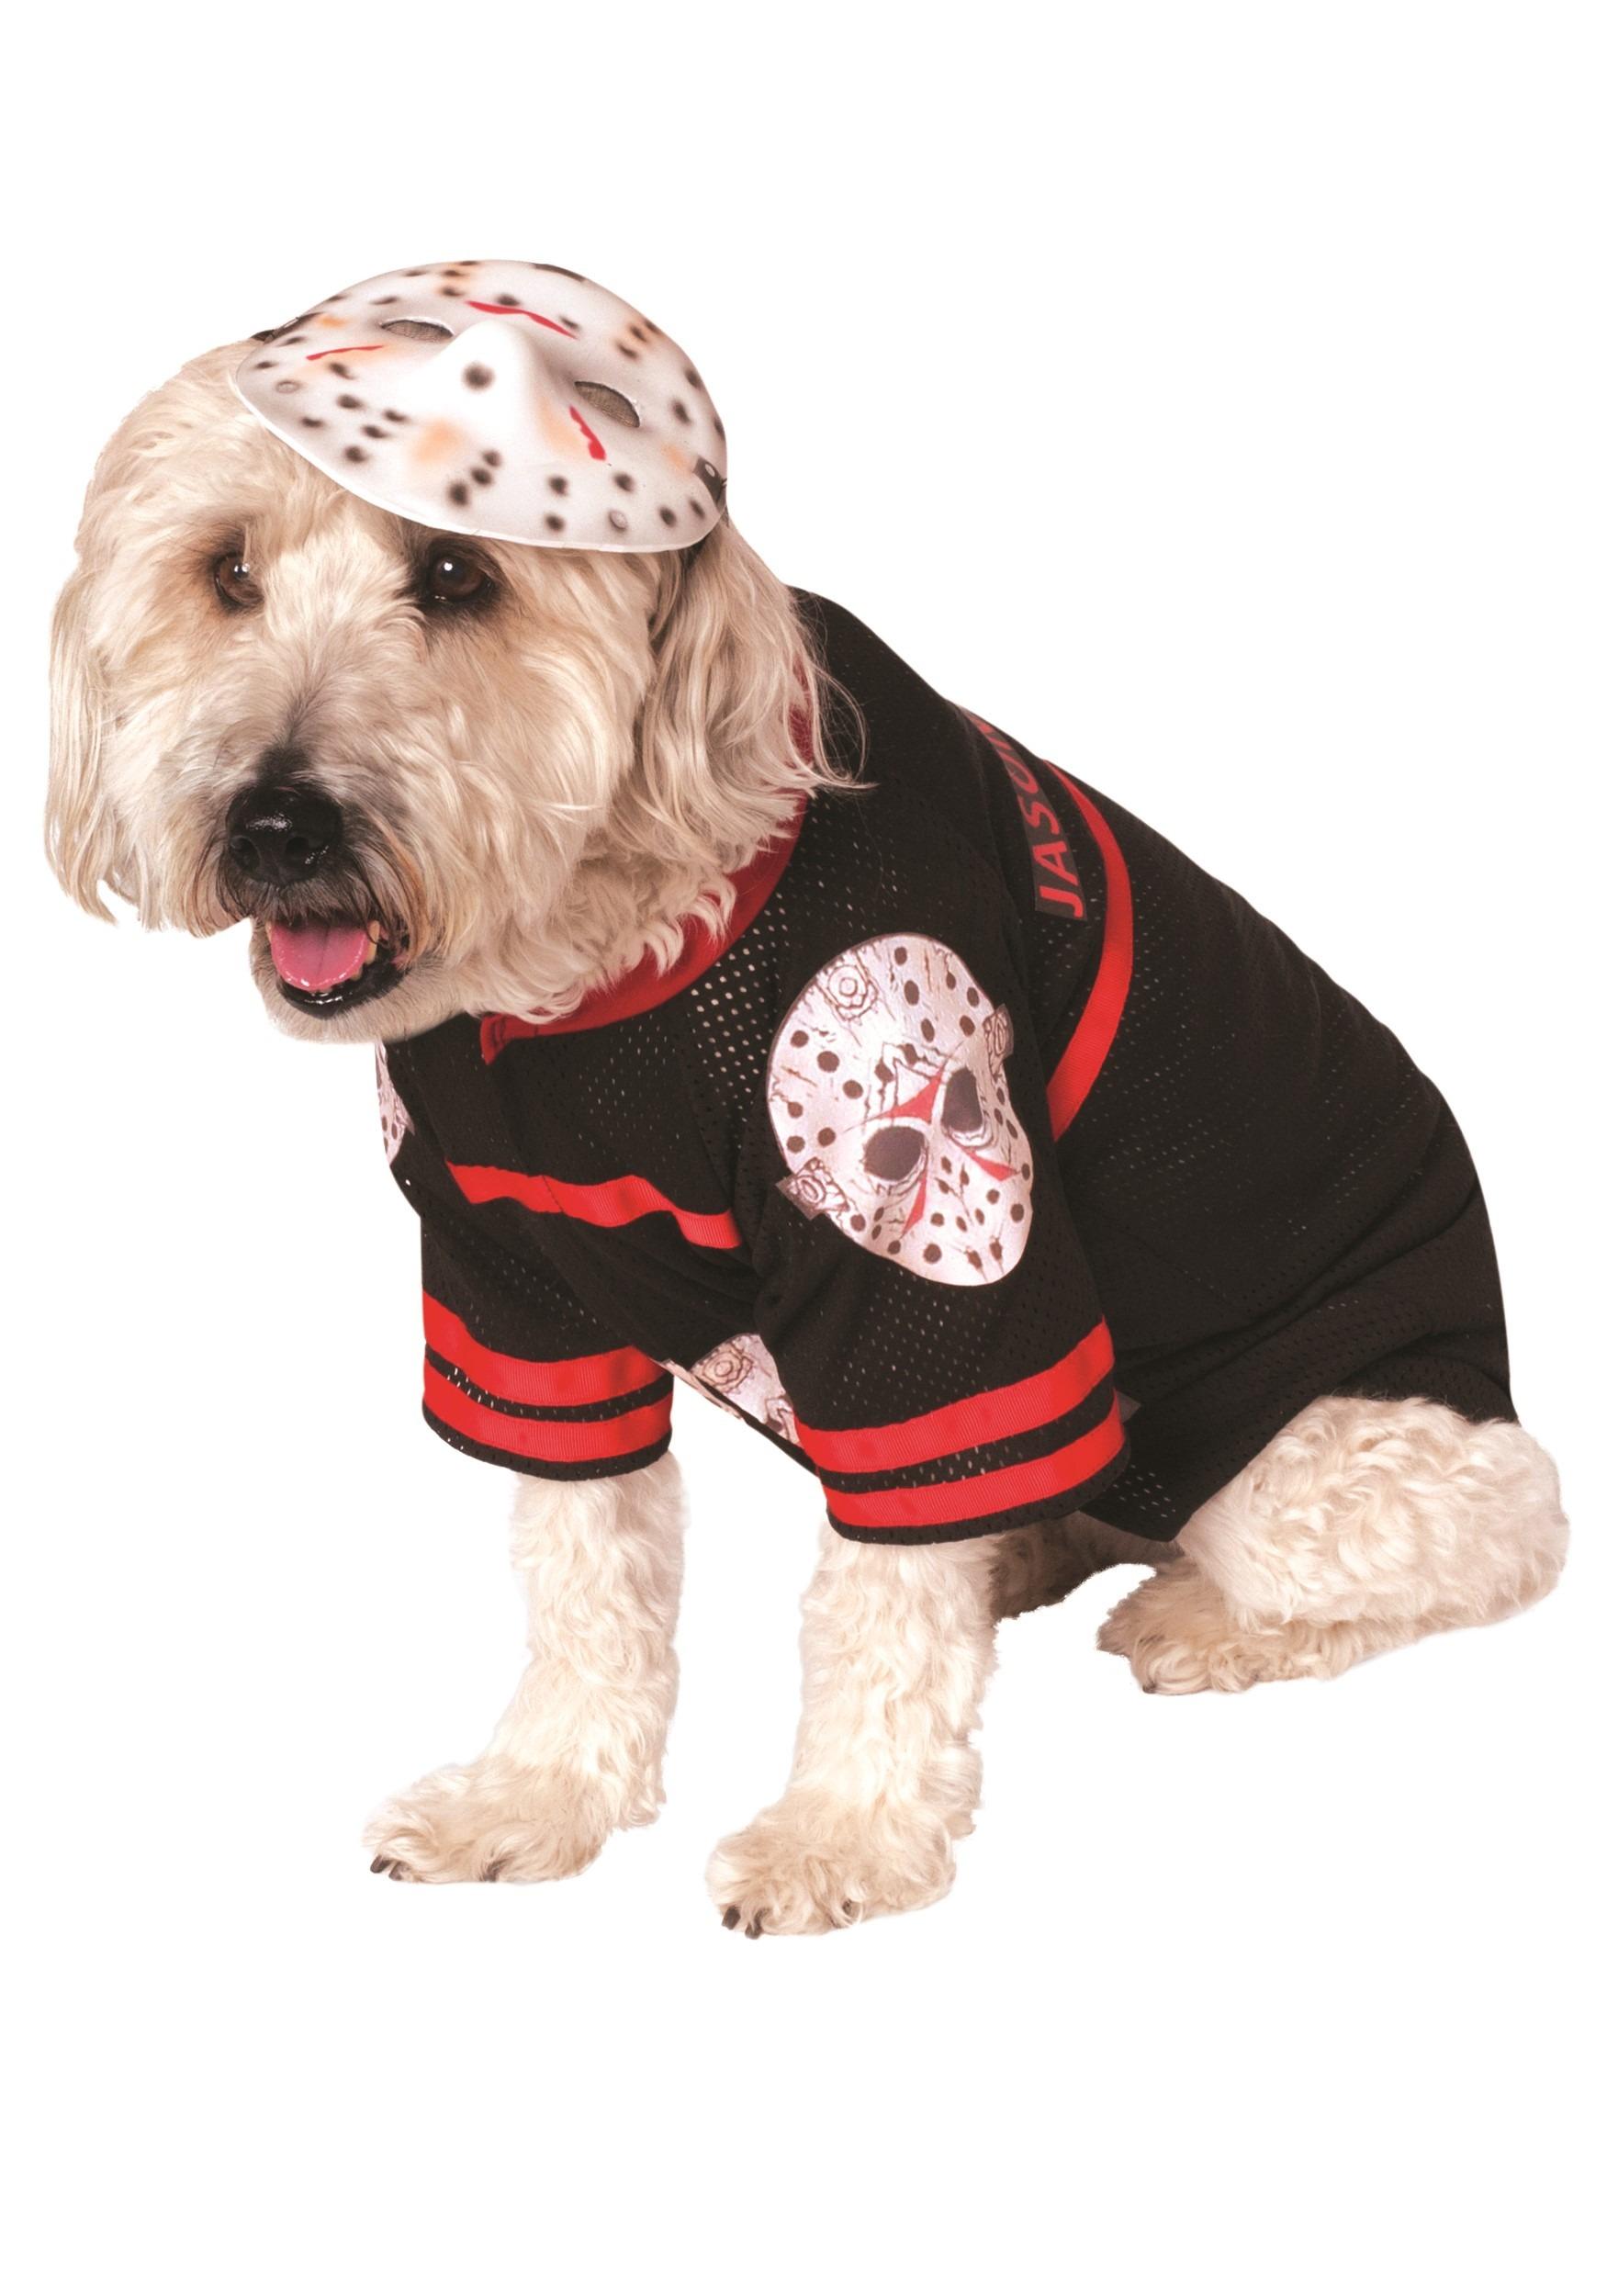 Pet Costume Jason Voorhees